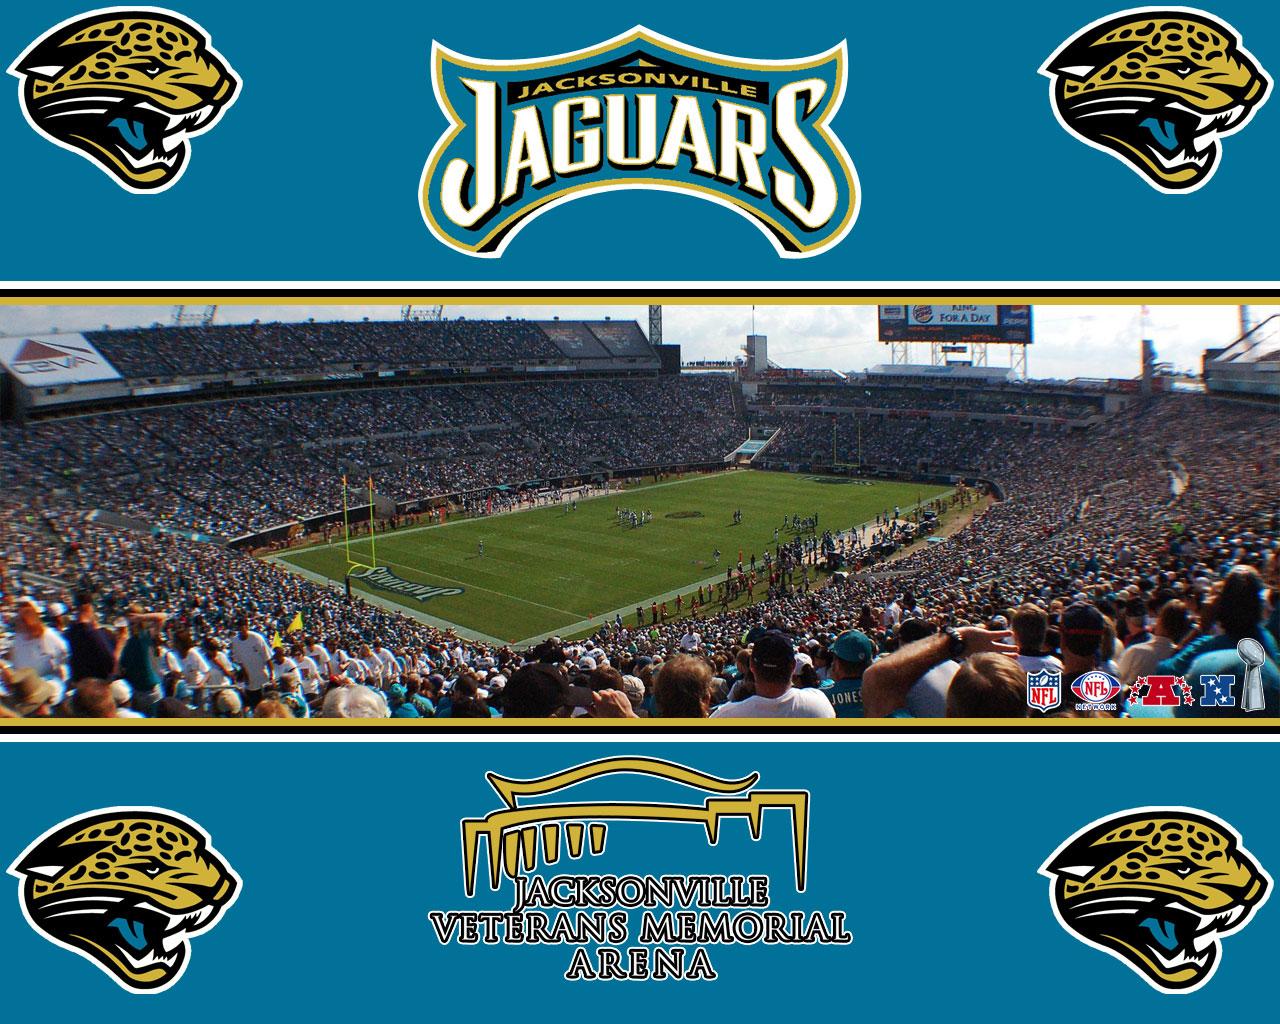 Jacksonville Jaguars Stadium Wallpaper